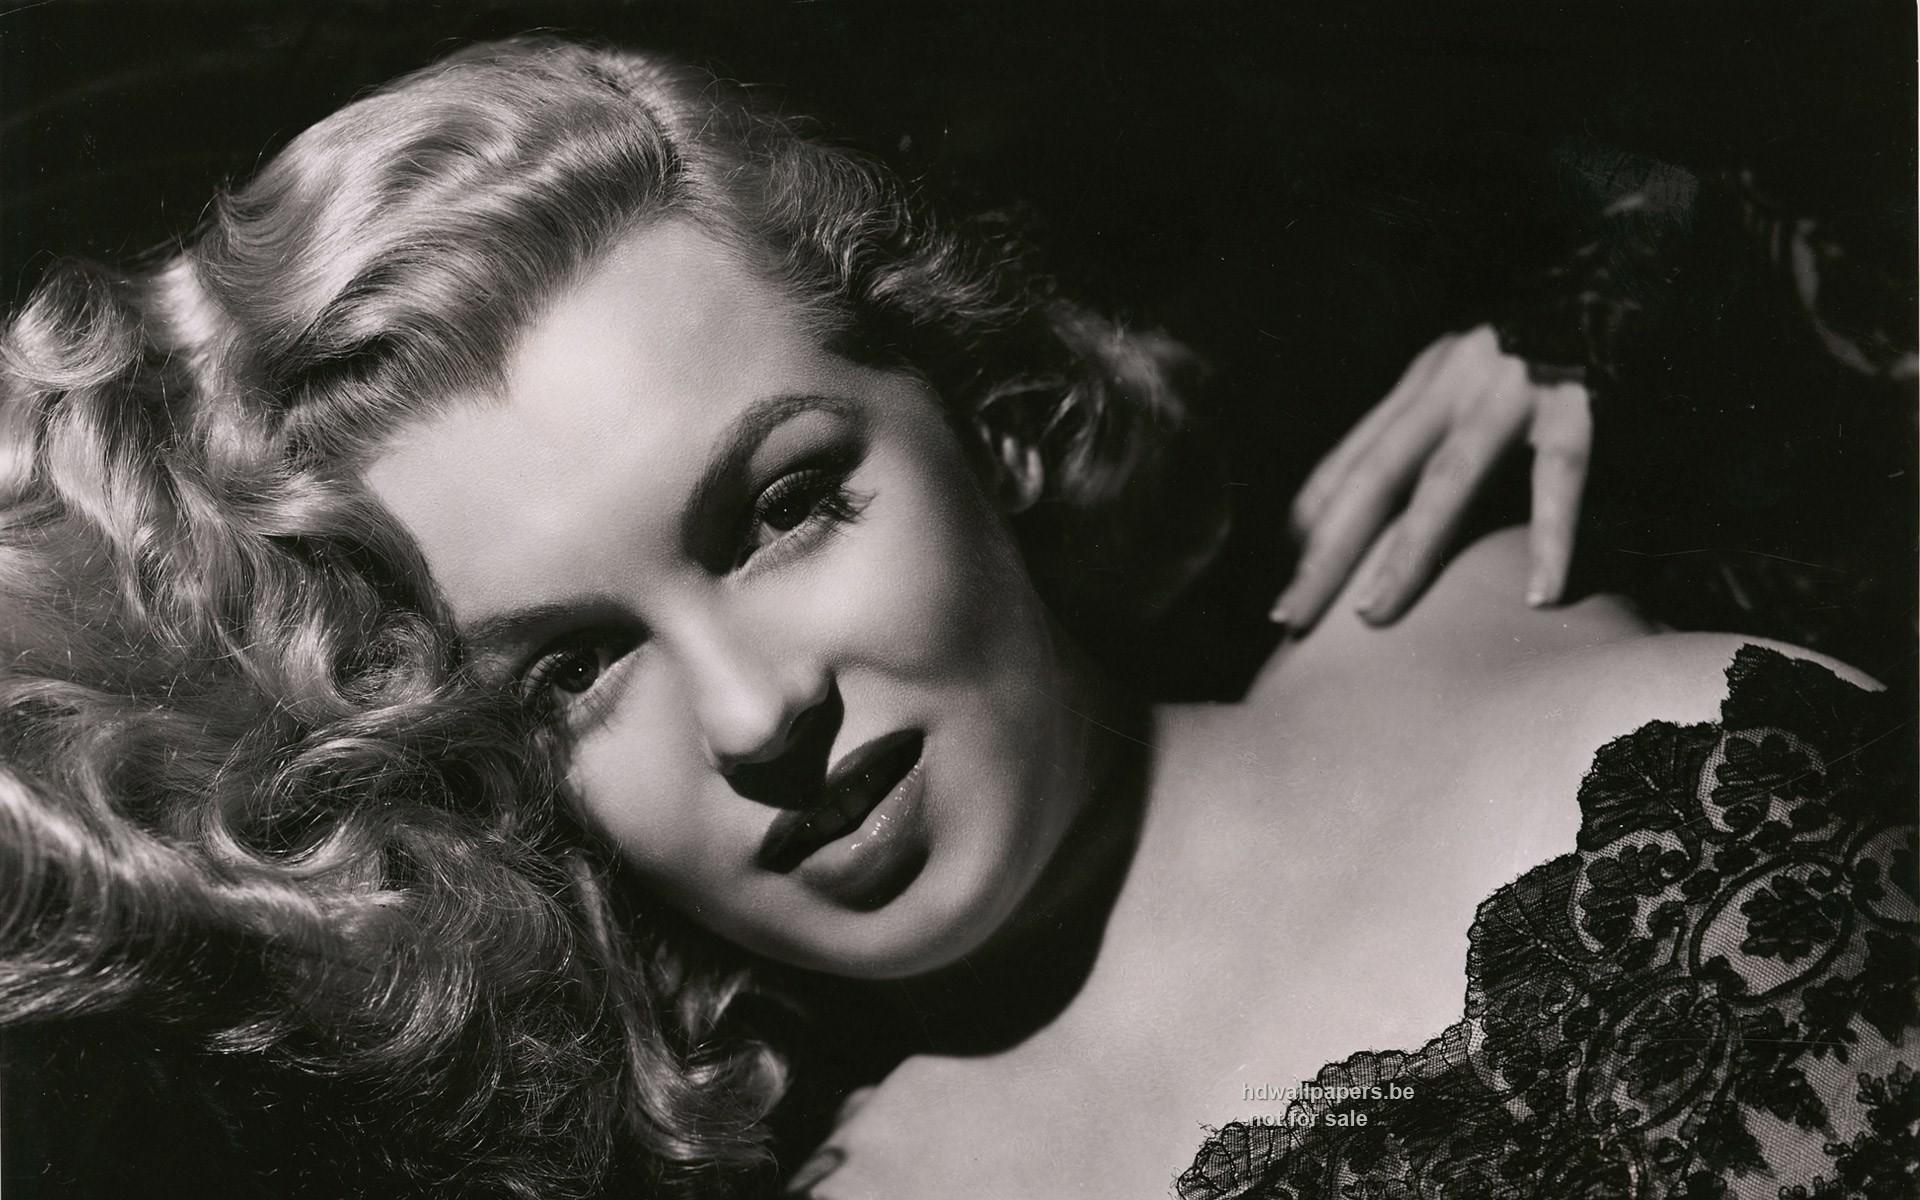 Marilyn monroe james dean wallpaper 39 images - Marilyn monroe wallpaper download ...